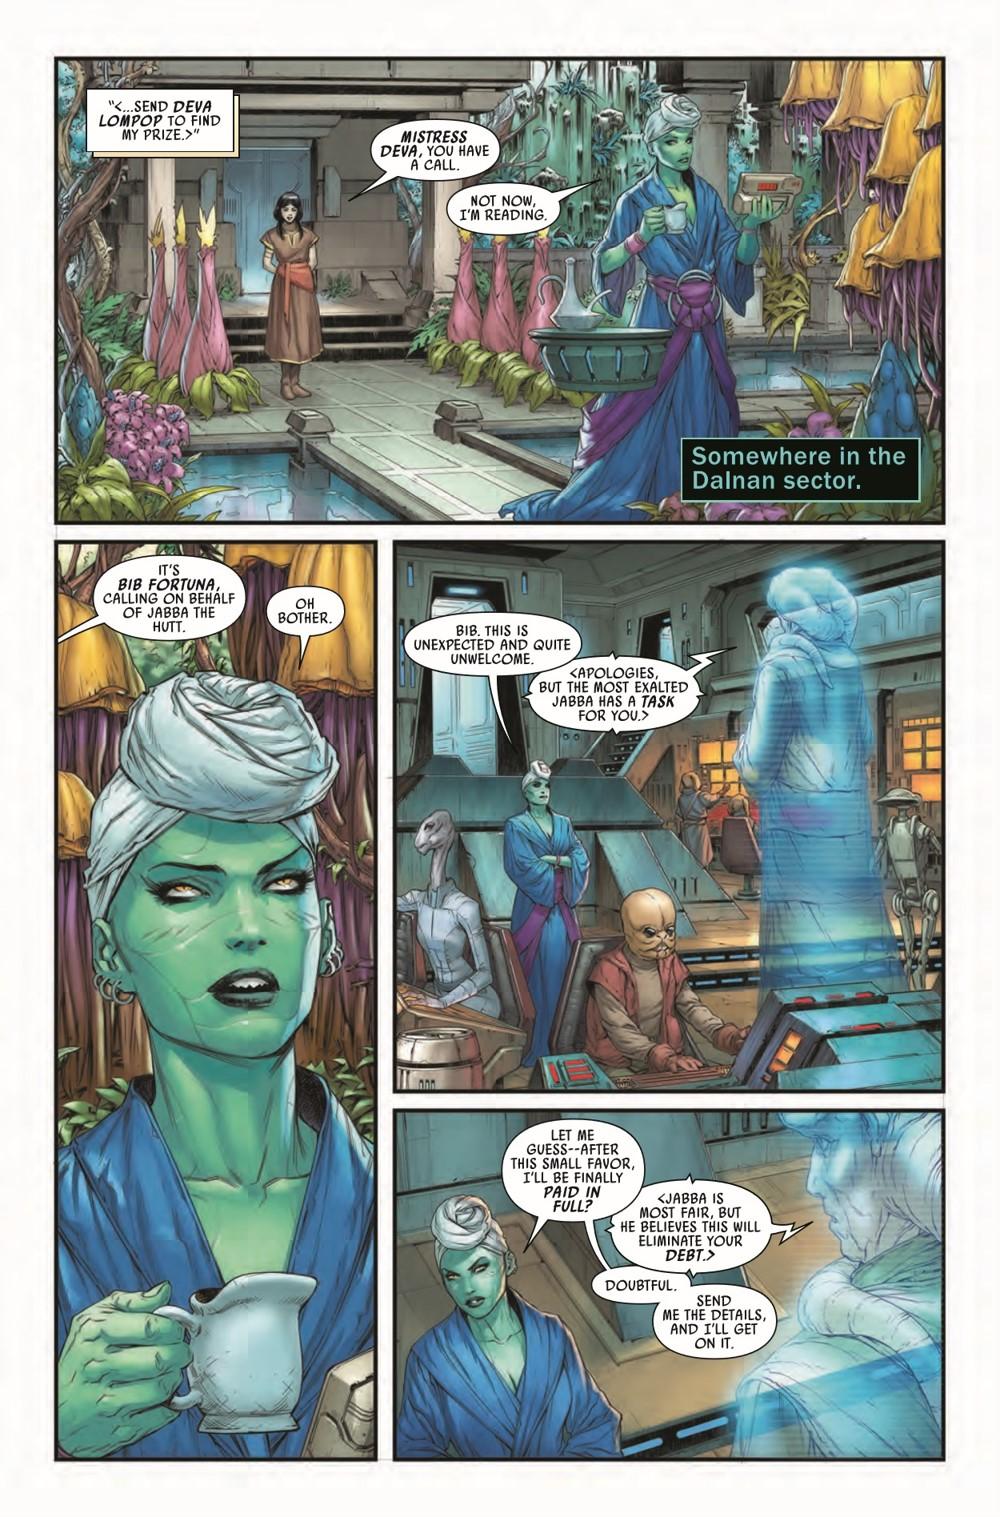 STWWAROTBHJABBAT2021001_Preview-4 ComicList Previews: STAR WARS WAR OF THE BOUNTY HUNTERS JABBA THE HUTT #1